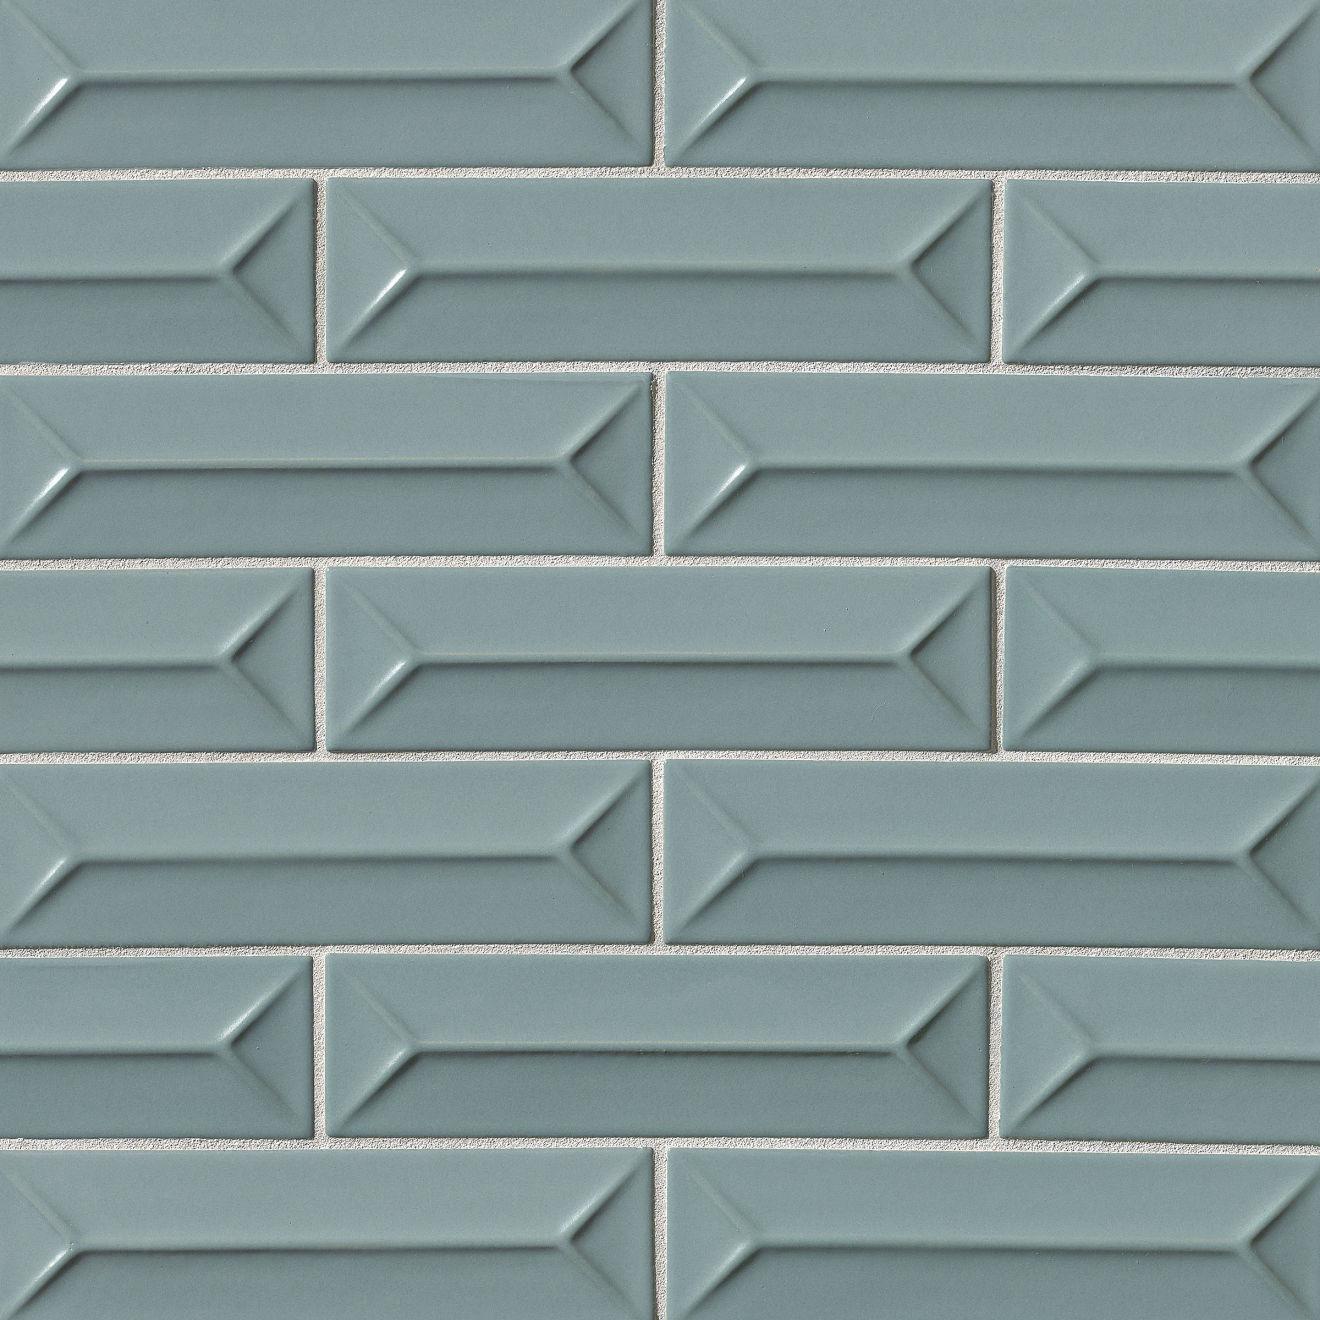 "Costa Allegra 2.5"" x 9"" Decorative Tile in Tide"